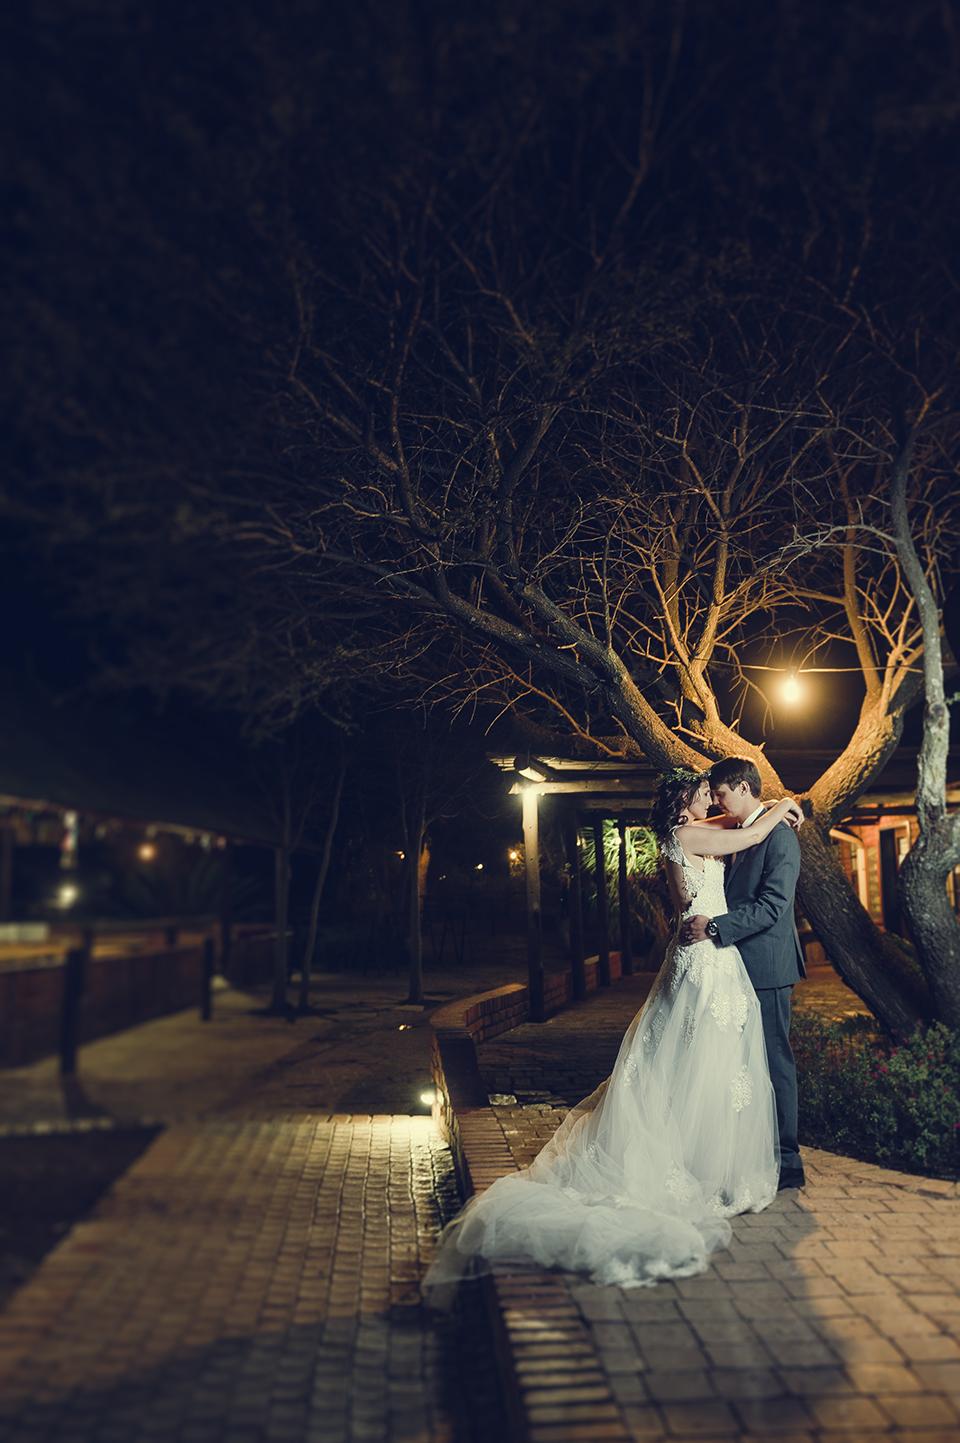 RyanParker_WeddingPhotographer_Pretoria_RosemaryHill_Gauteng_P&R_DSC_7197.jpg